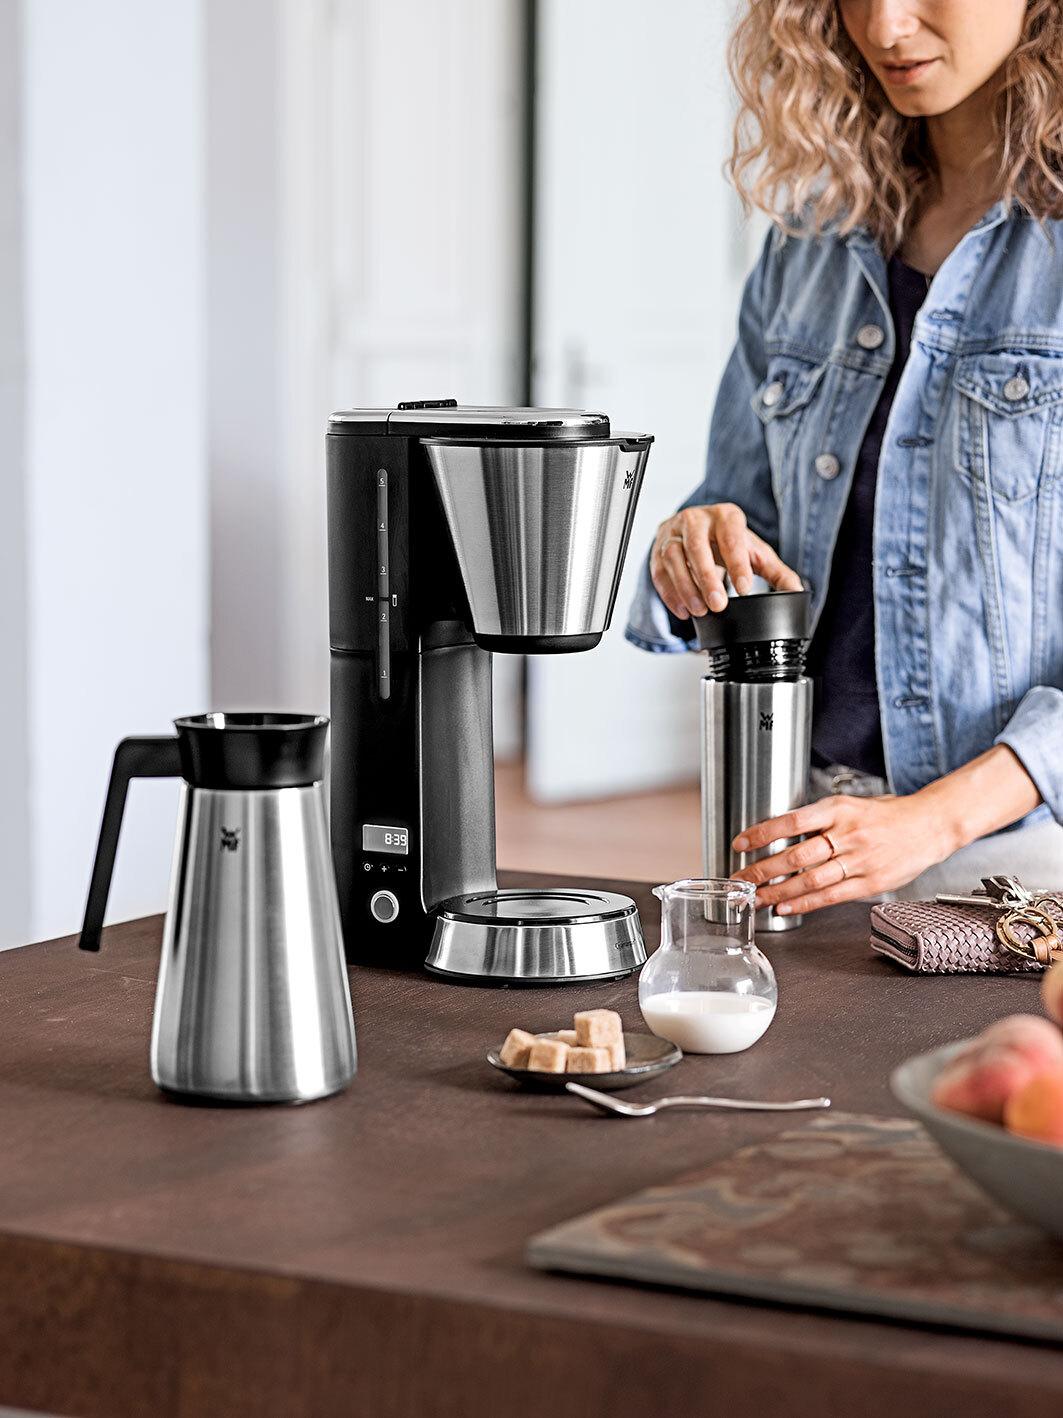 Frau mit WMF Kaffeemaschine